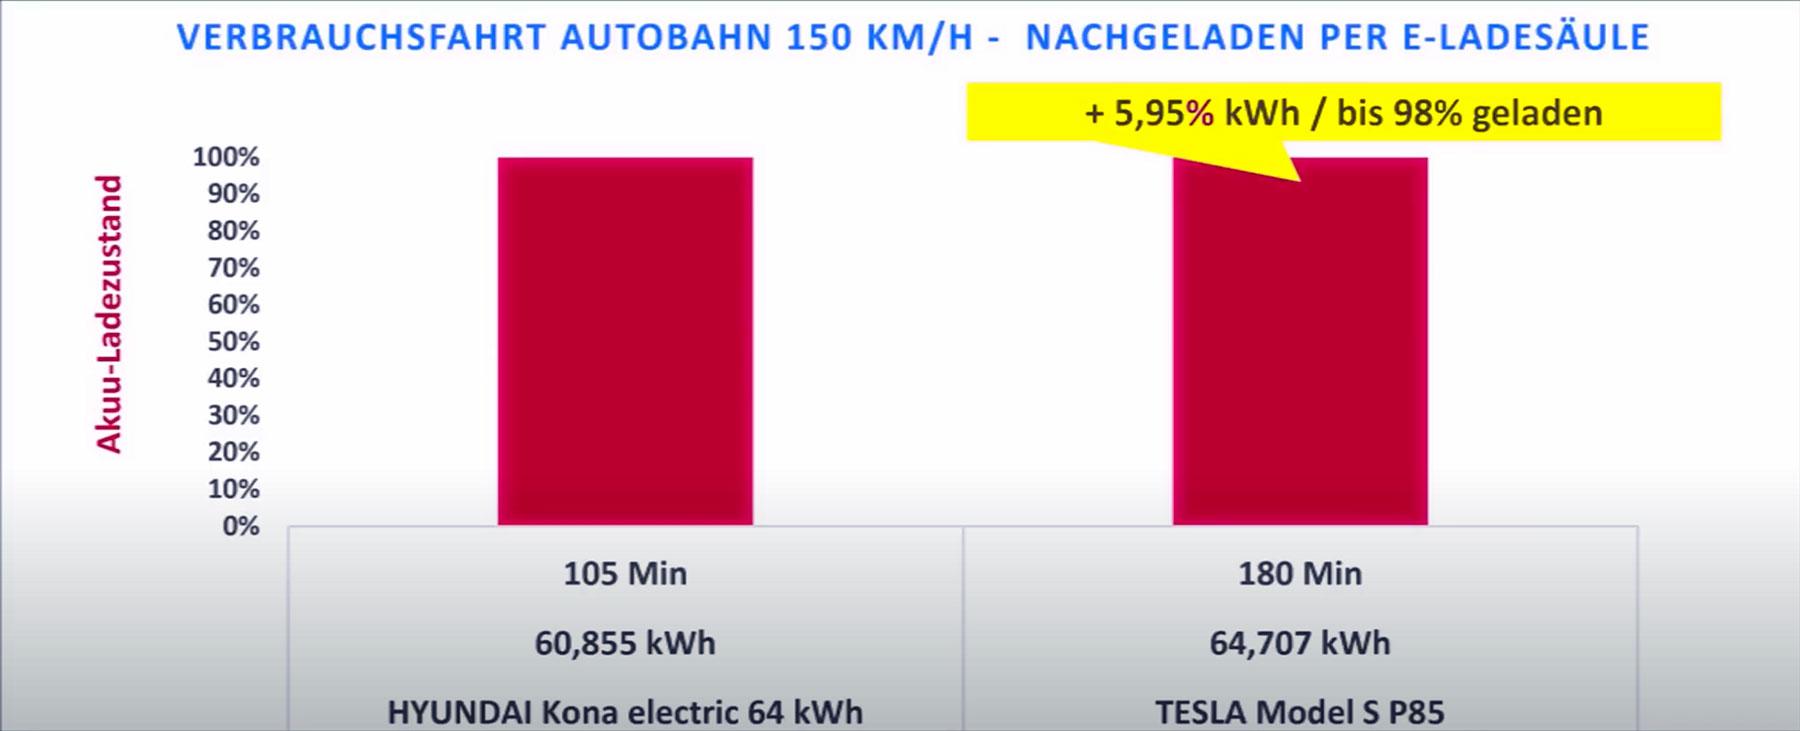 Donnerstag Kompakt: Model S vs Hyundai Kona bei 150 km/h, Youtube sperrt Planet of the Humans, gebrauchte Teslas verkaufen sich prächtig, Frankreichs Subventionspolitik